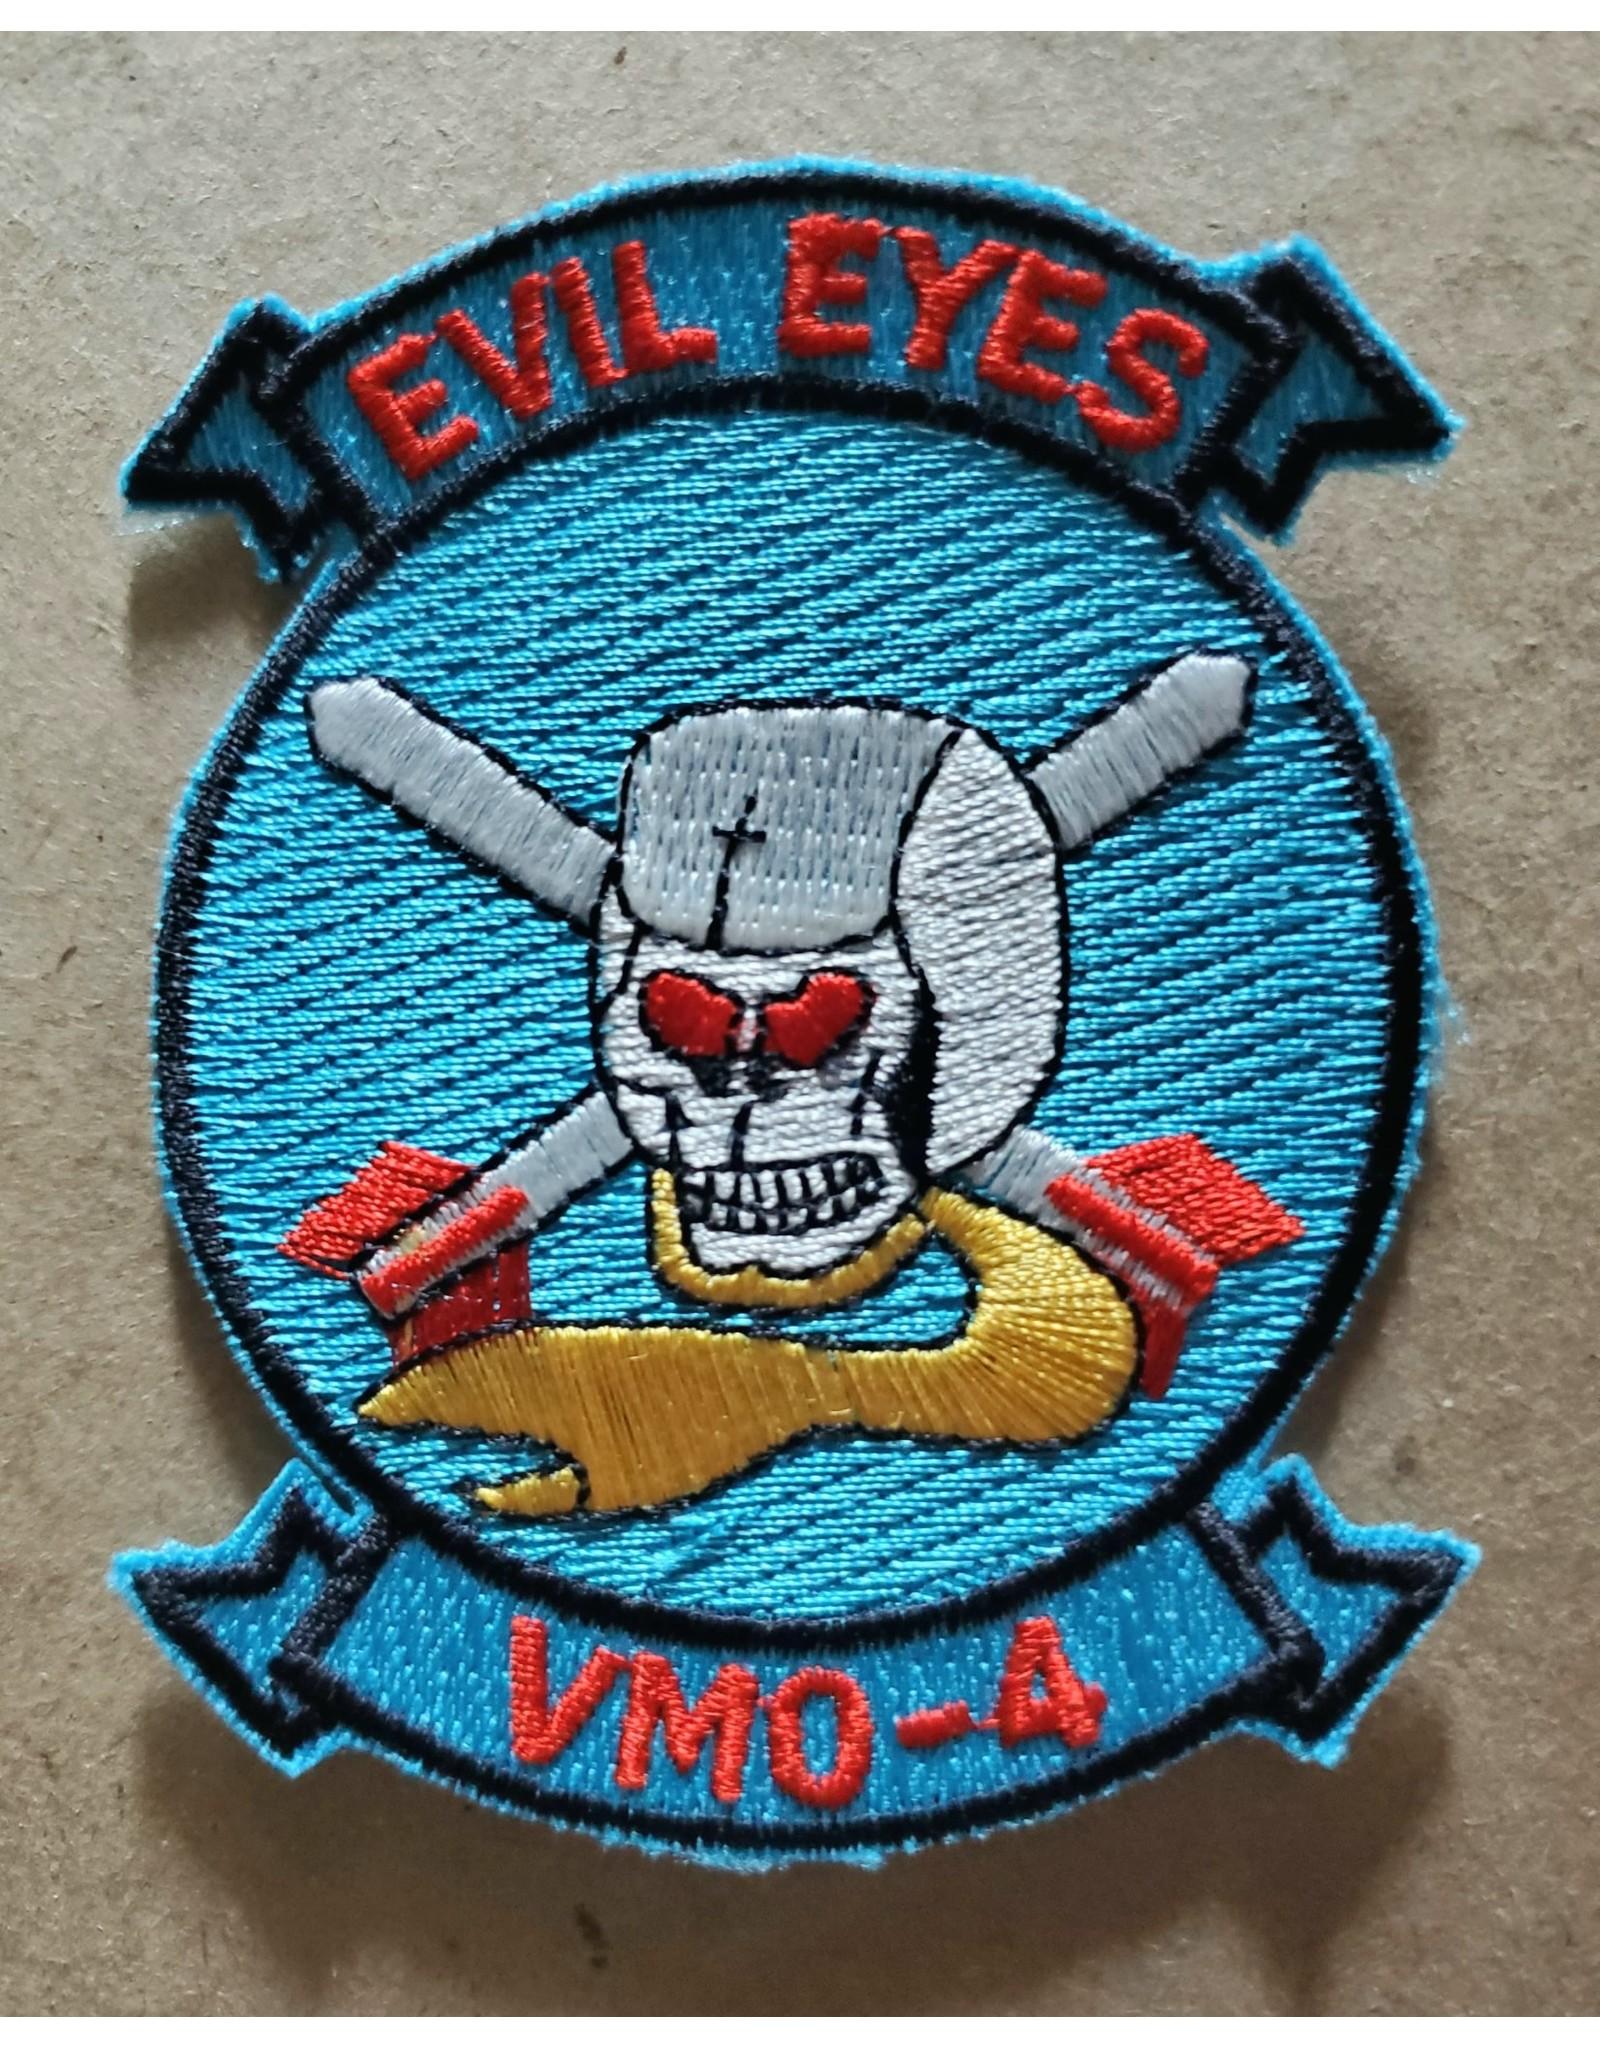 FWAM VMO-4 Evil Eyes Large (11), patch